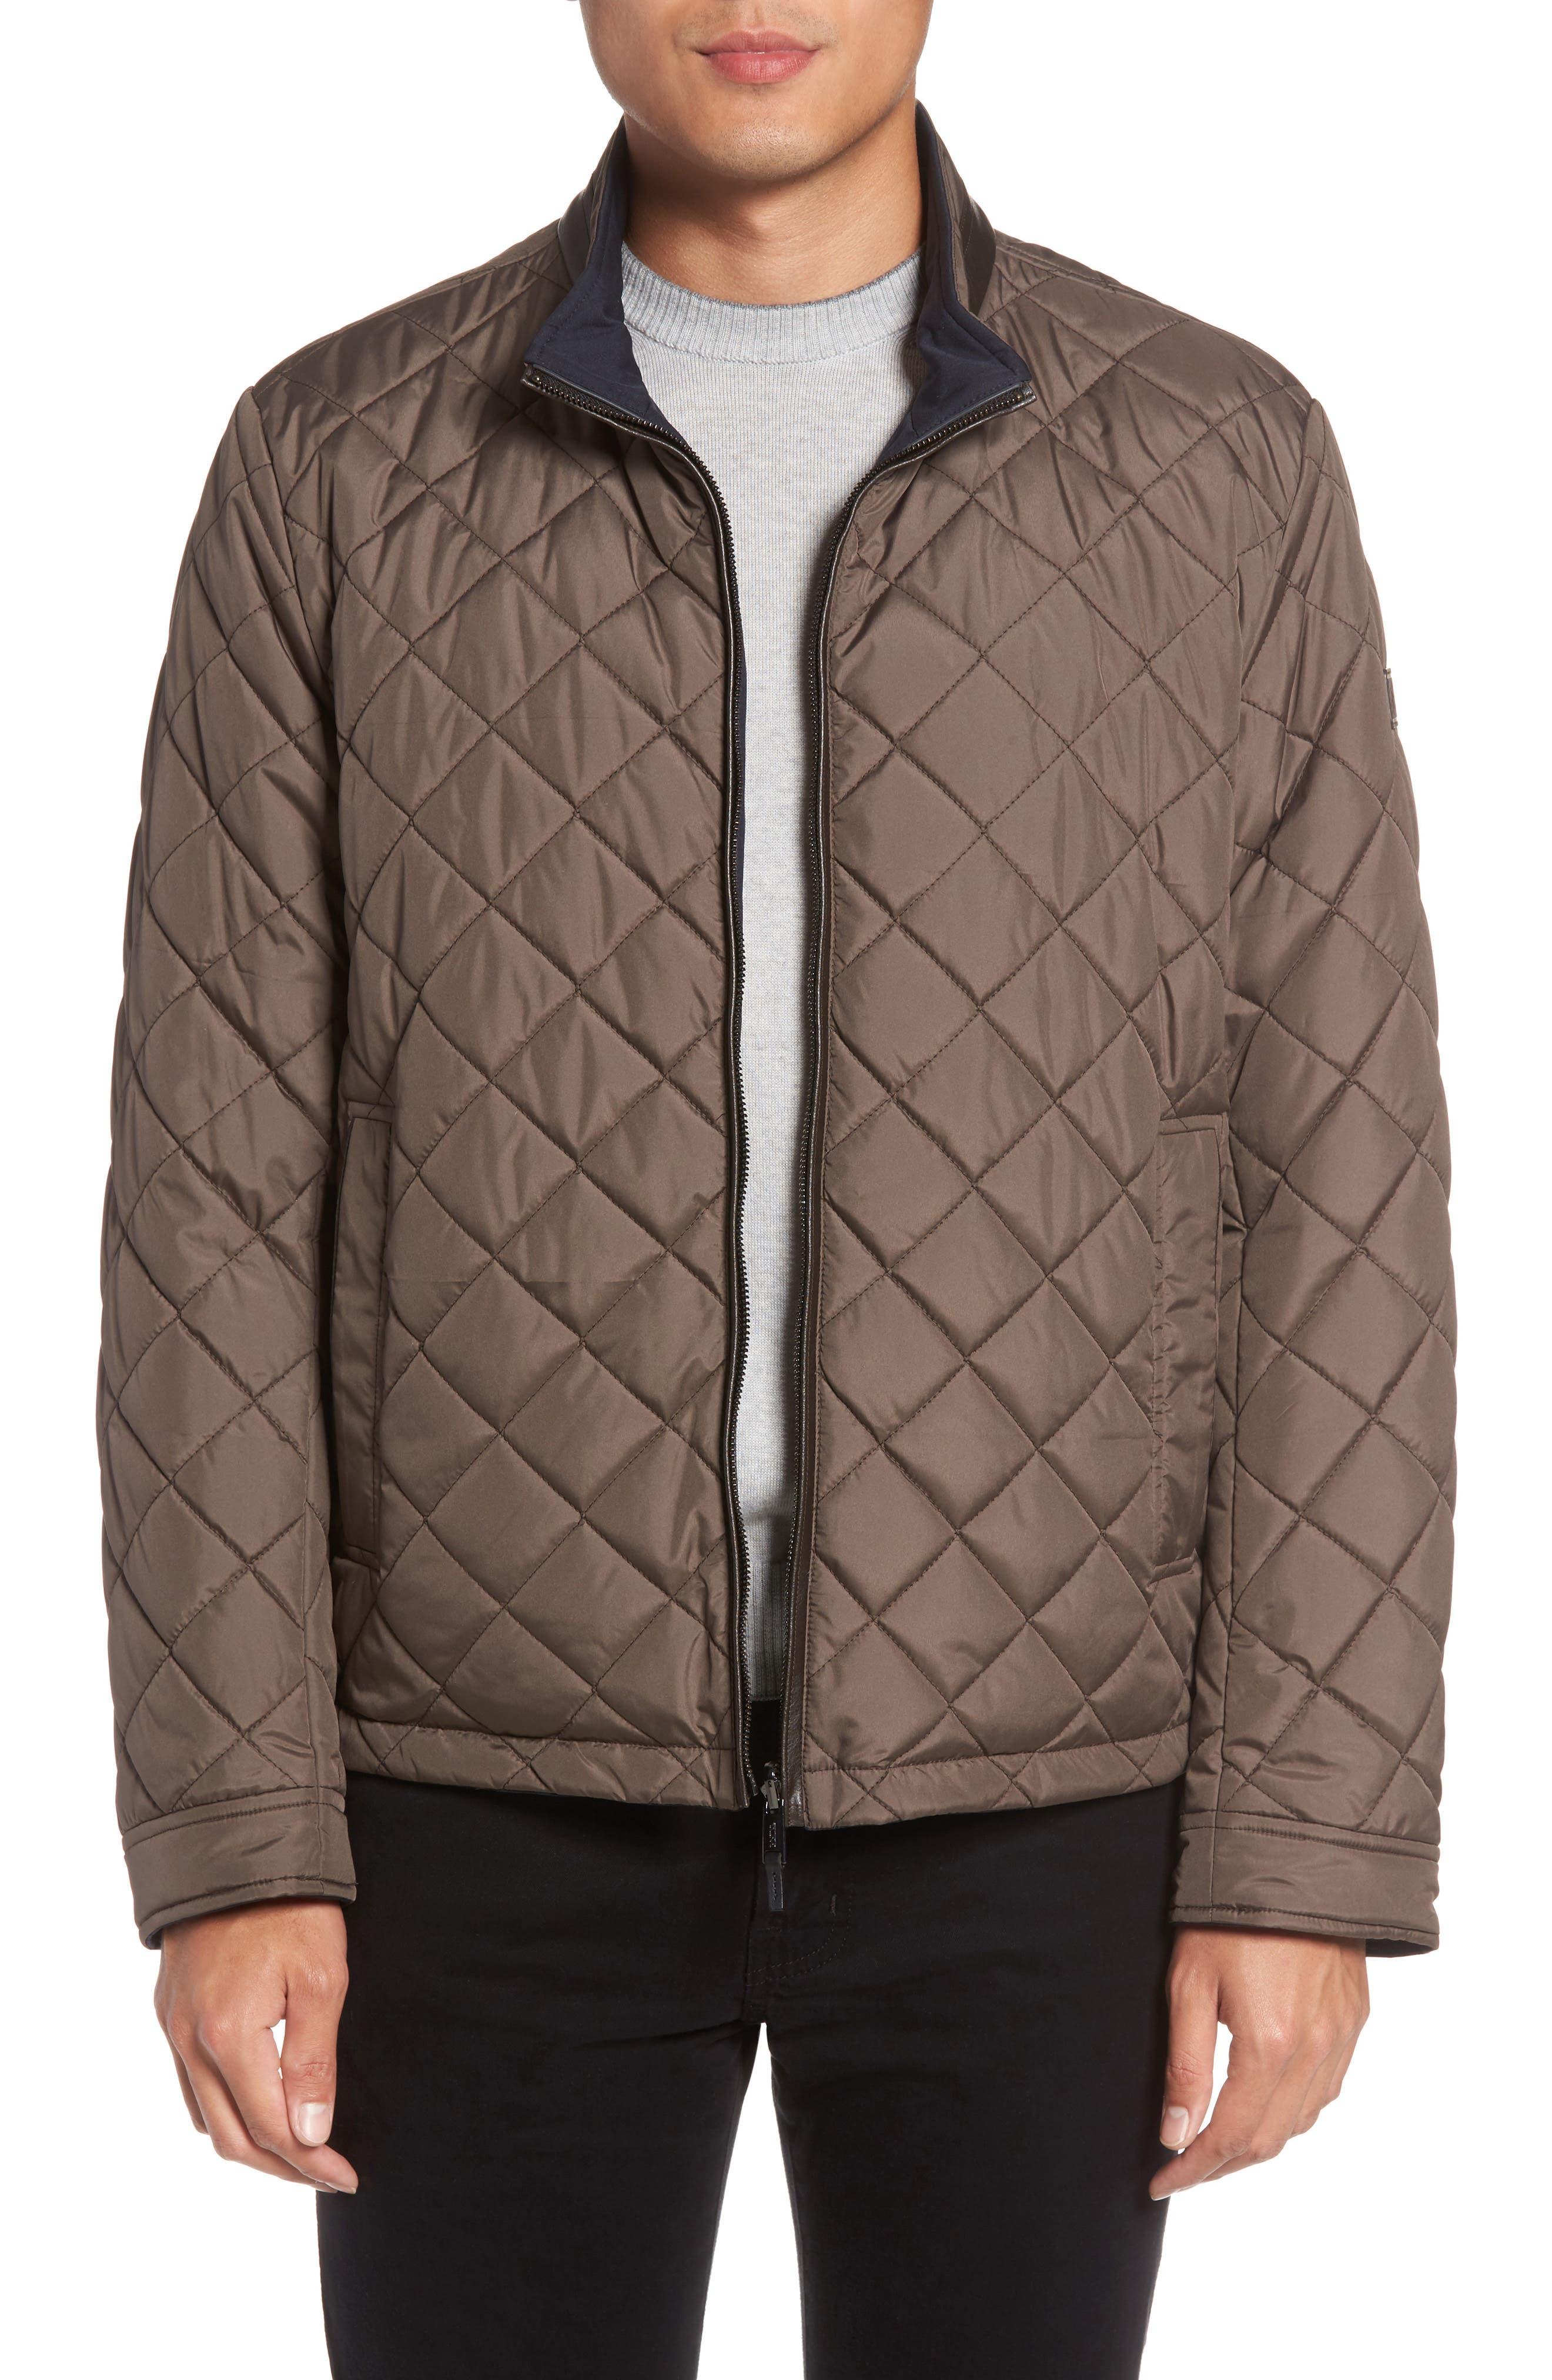 Alternate Image 1 Selected - Tumi Reversible Jacket